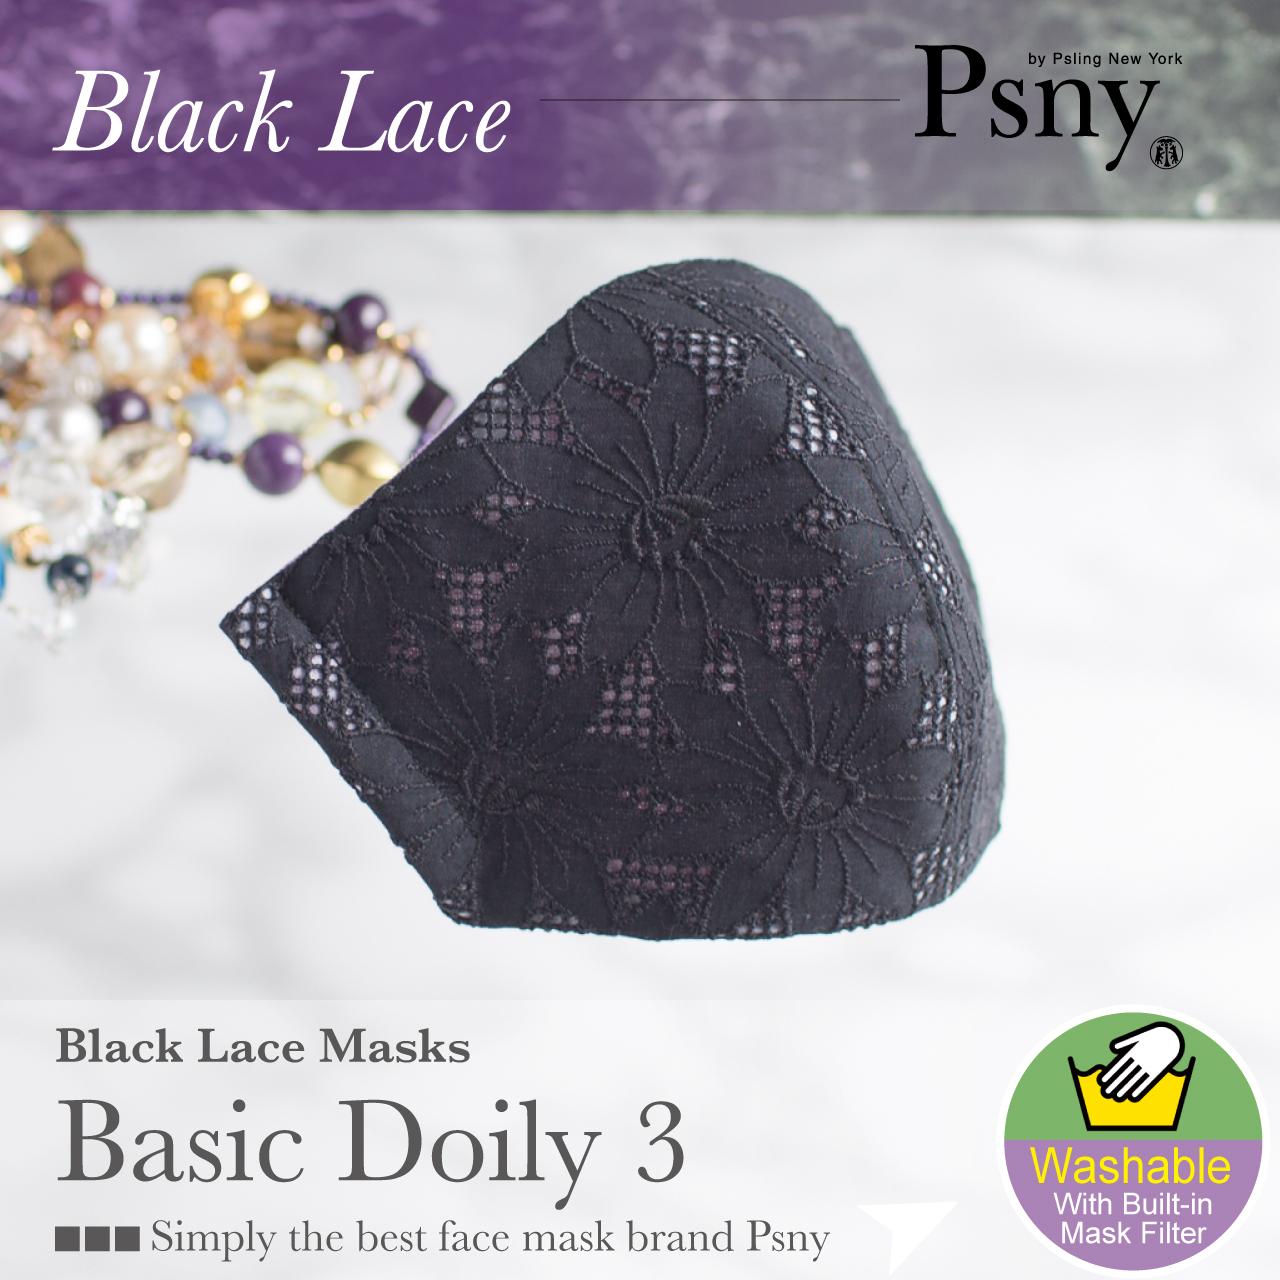 PSNY ブラック レース ドイリー3 花粉 黄砂 不織布フィルター入り 立体 ドレス おとな 大人用 マスク 送料無料 LD3